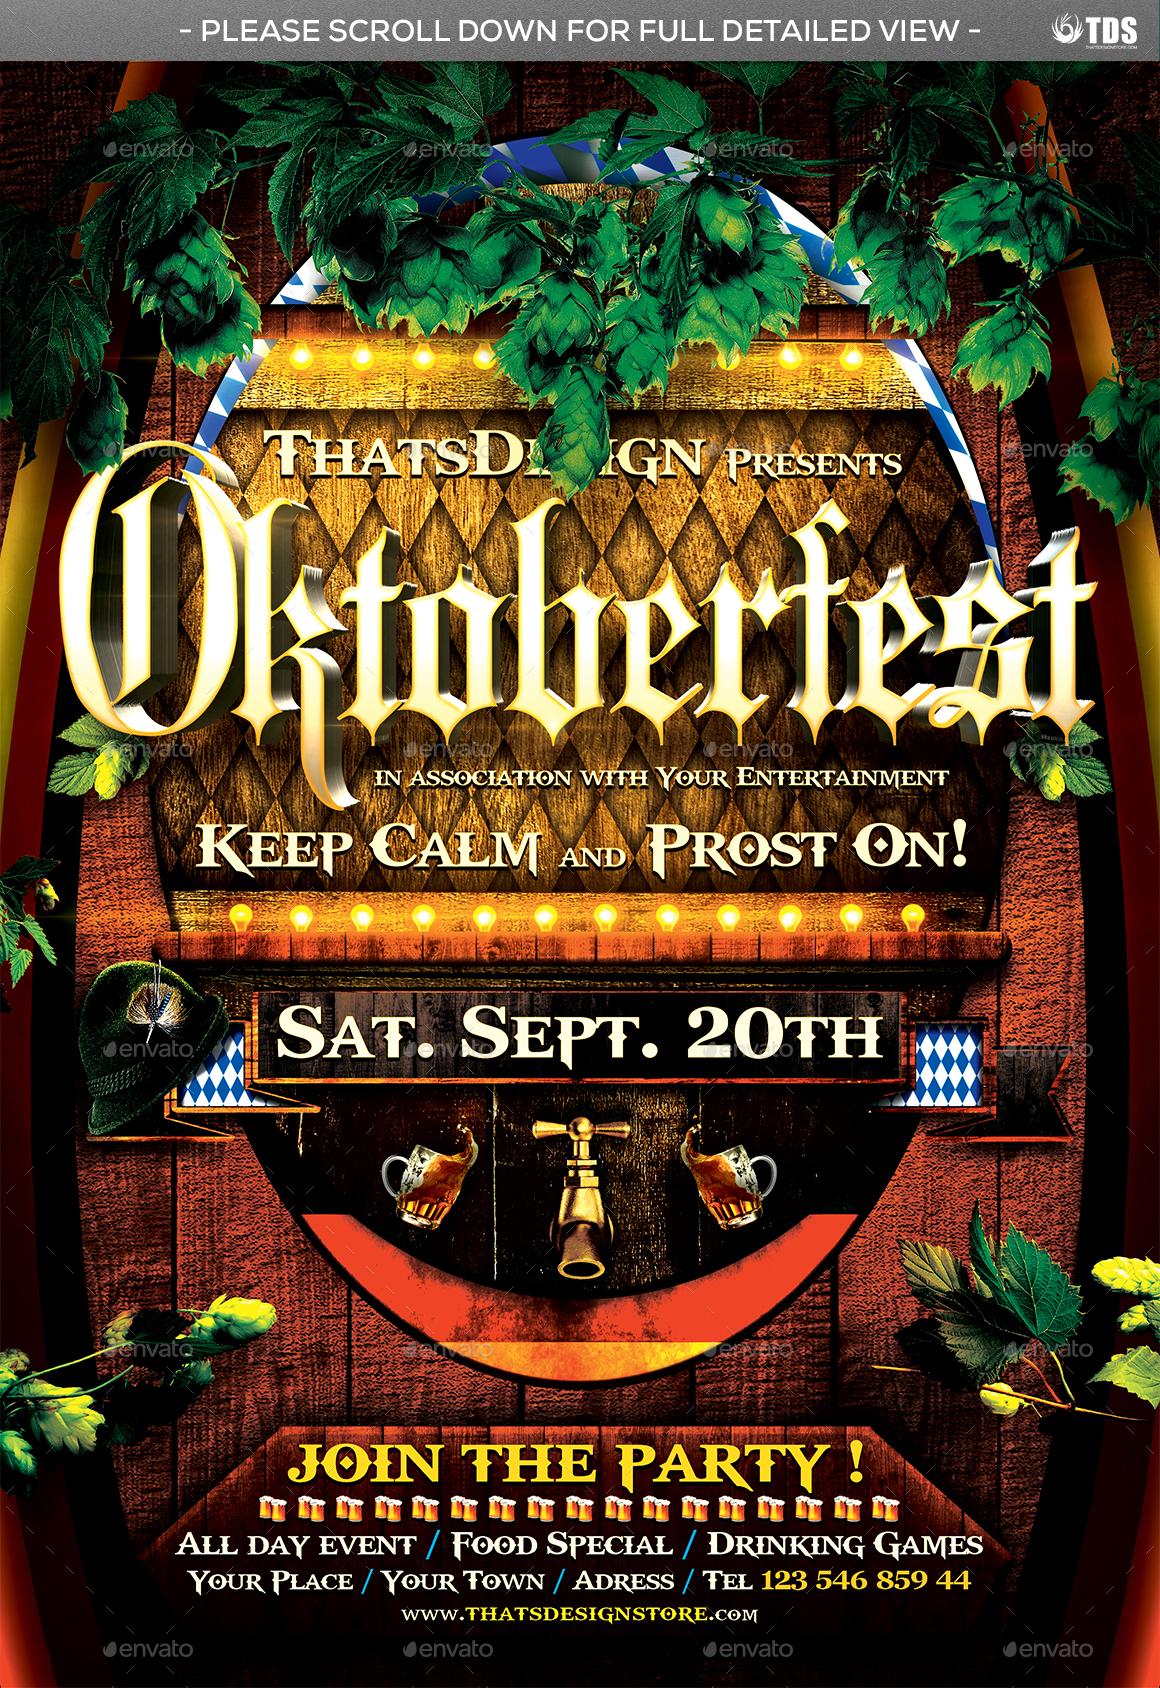 Oktoberfest Flyer Template V6 by lou606 | GraphicRiver